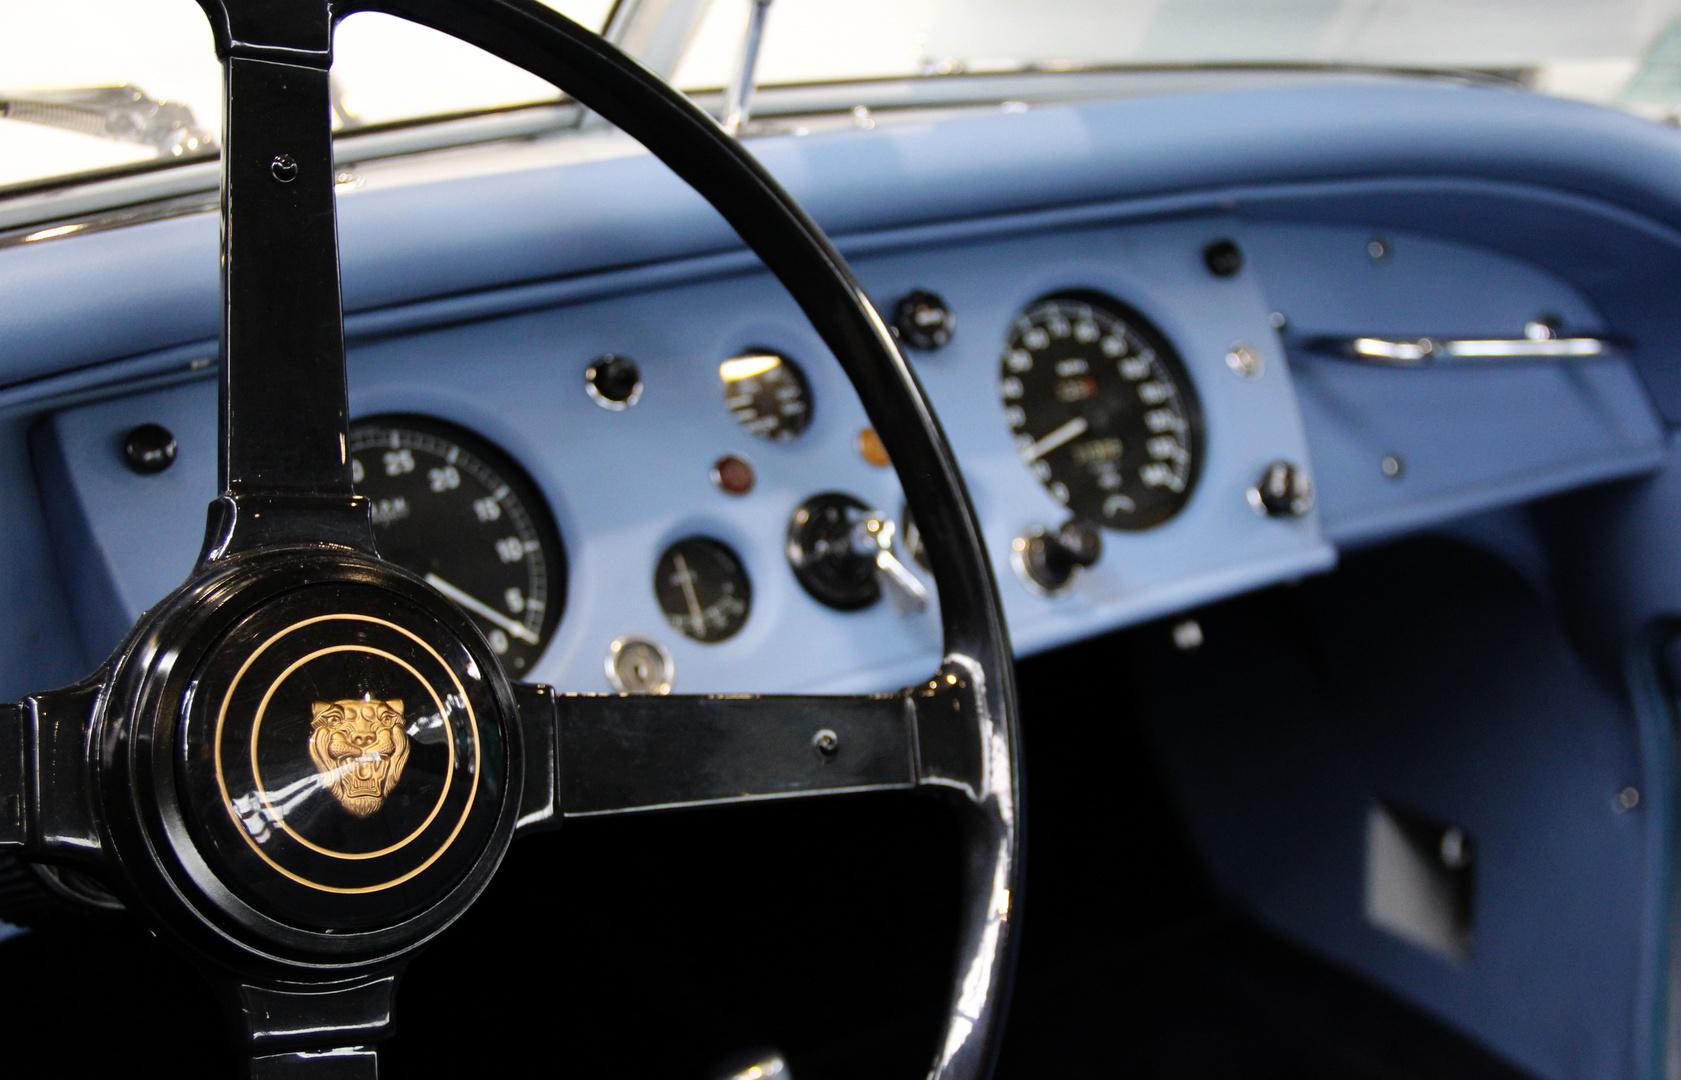 Blau hinterm Lenkrad